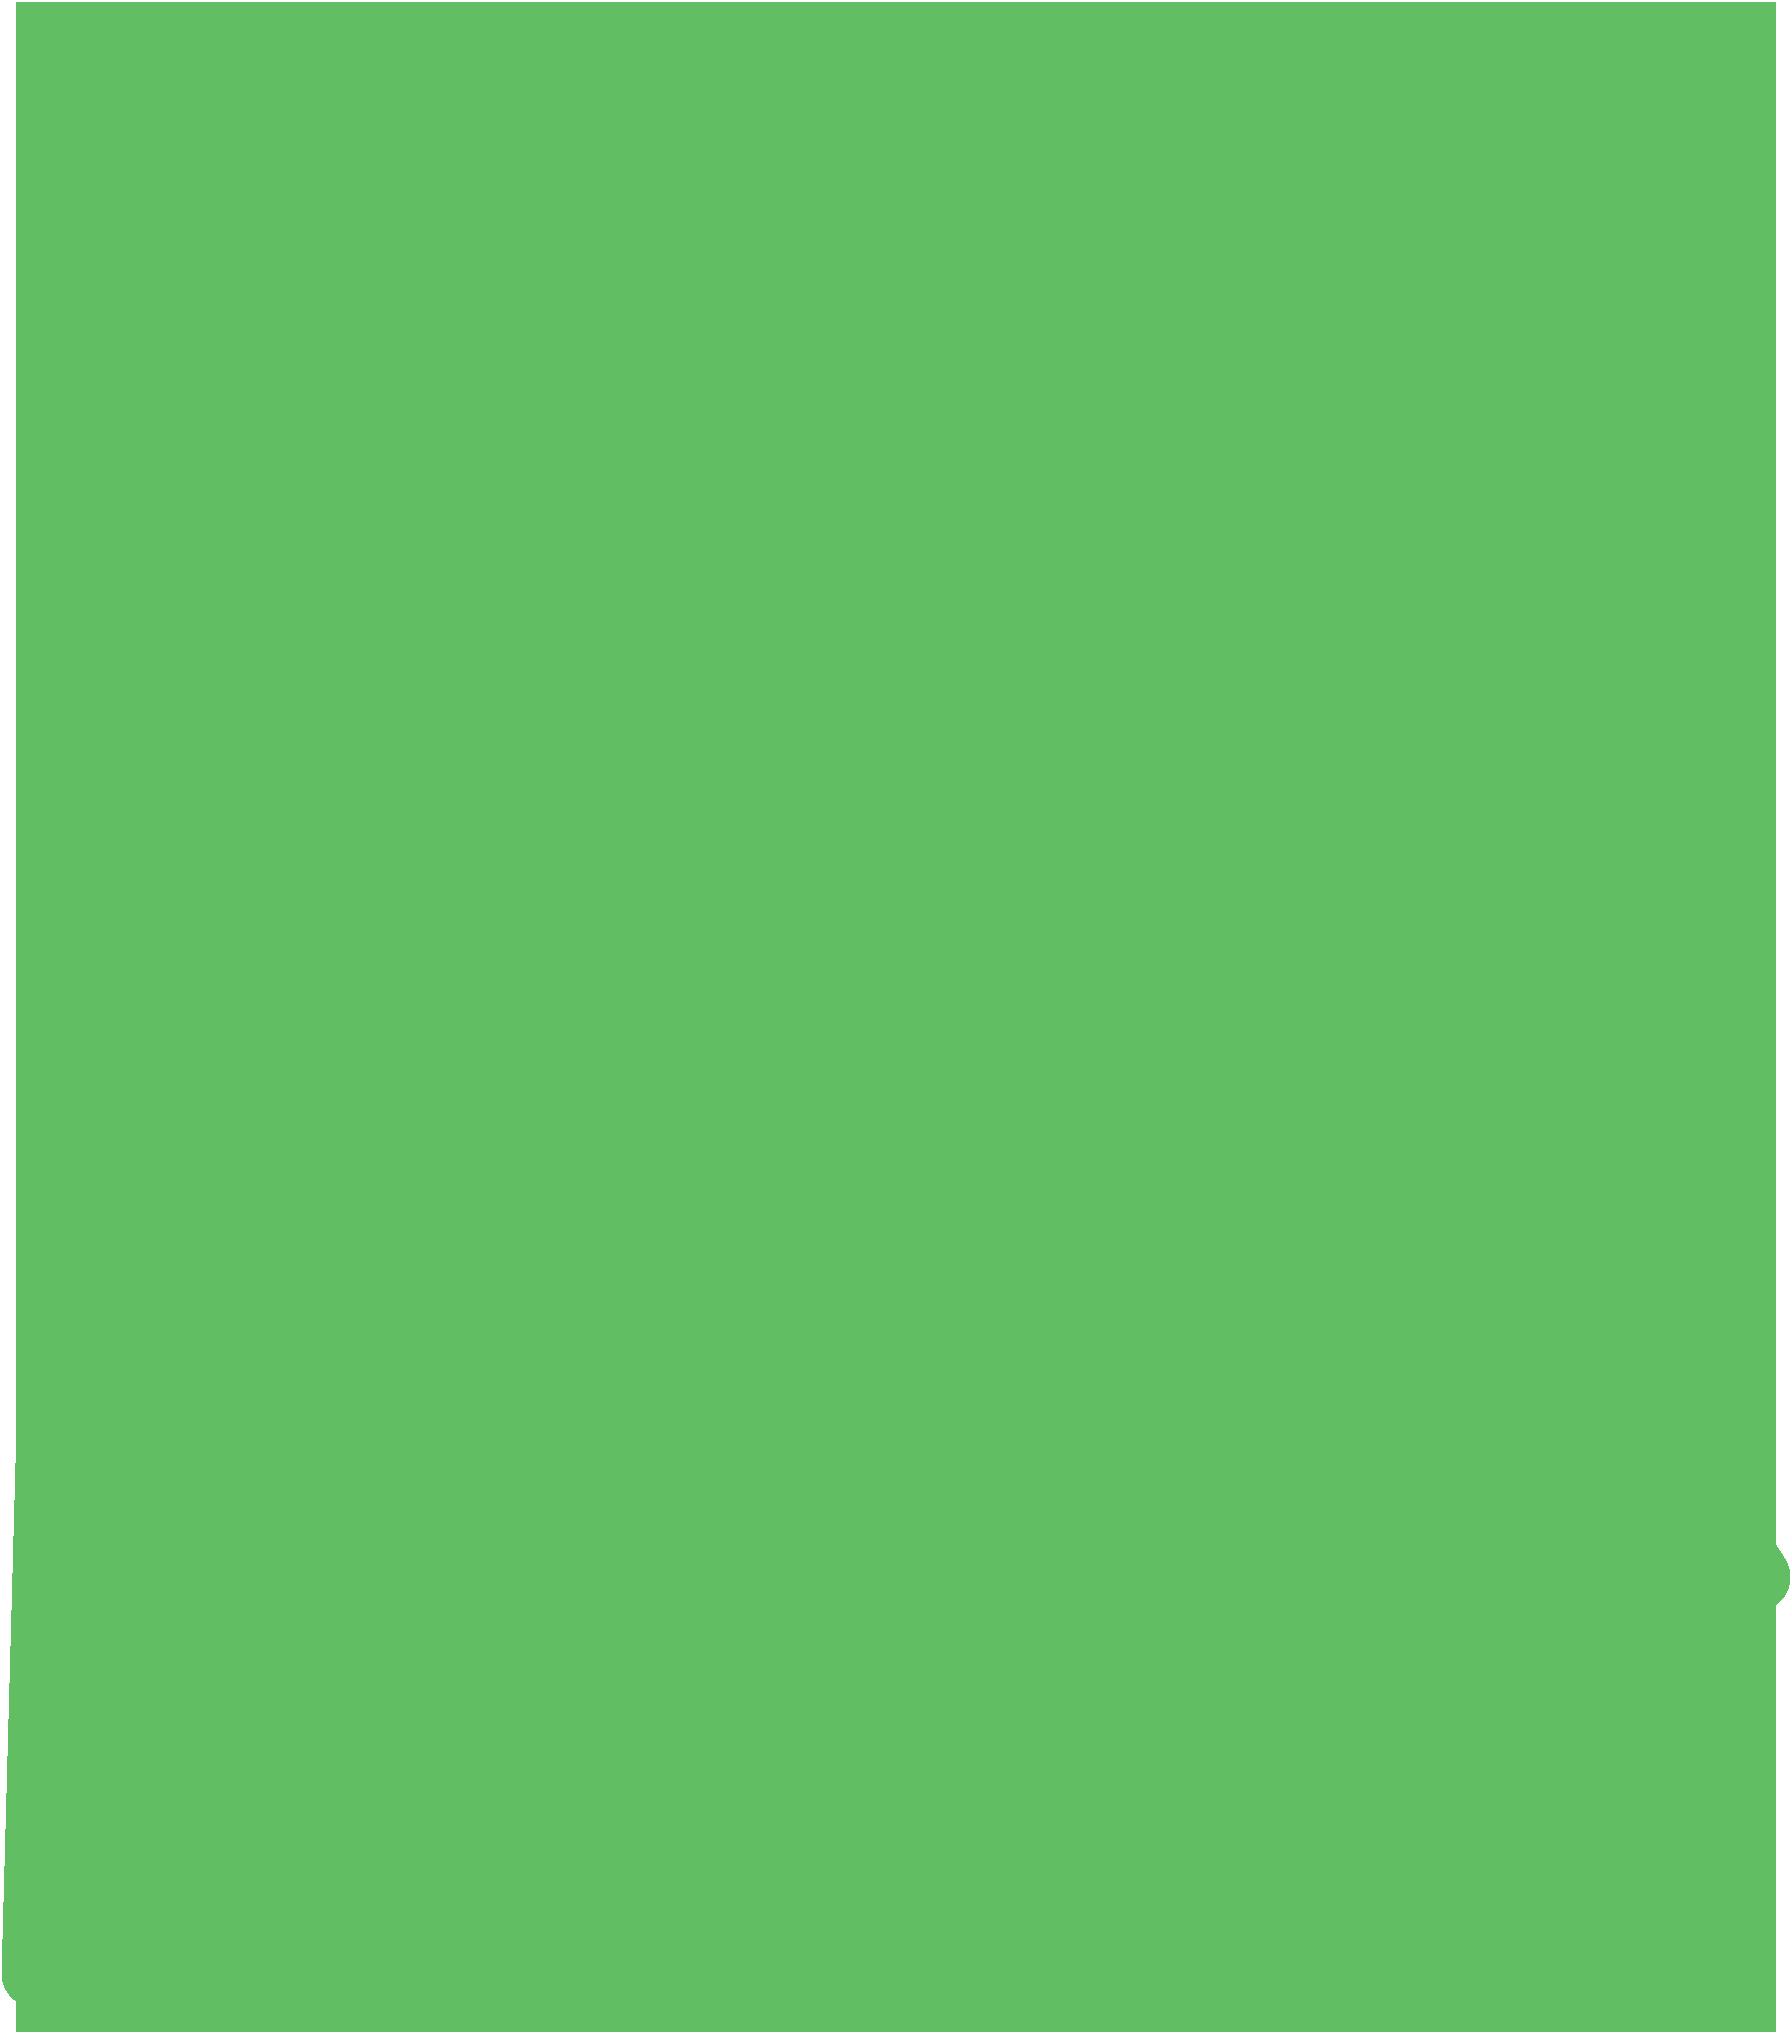 save-money-green-2